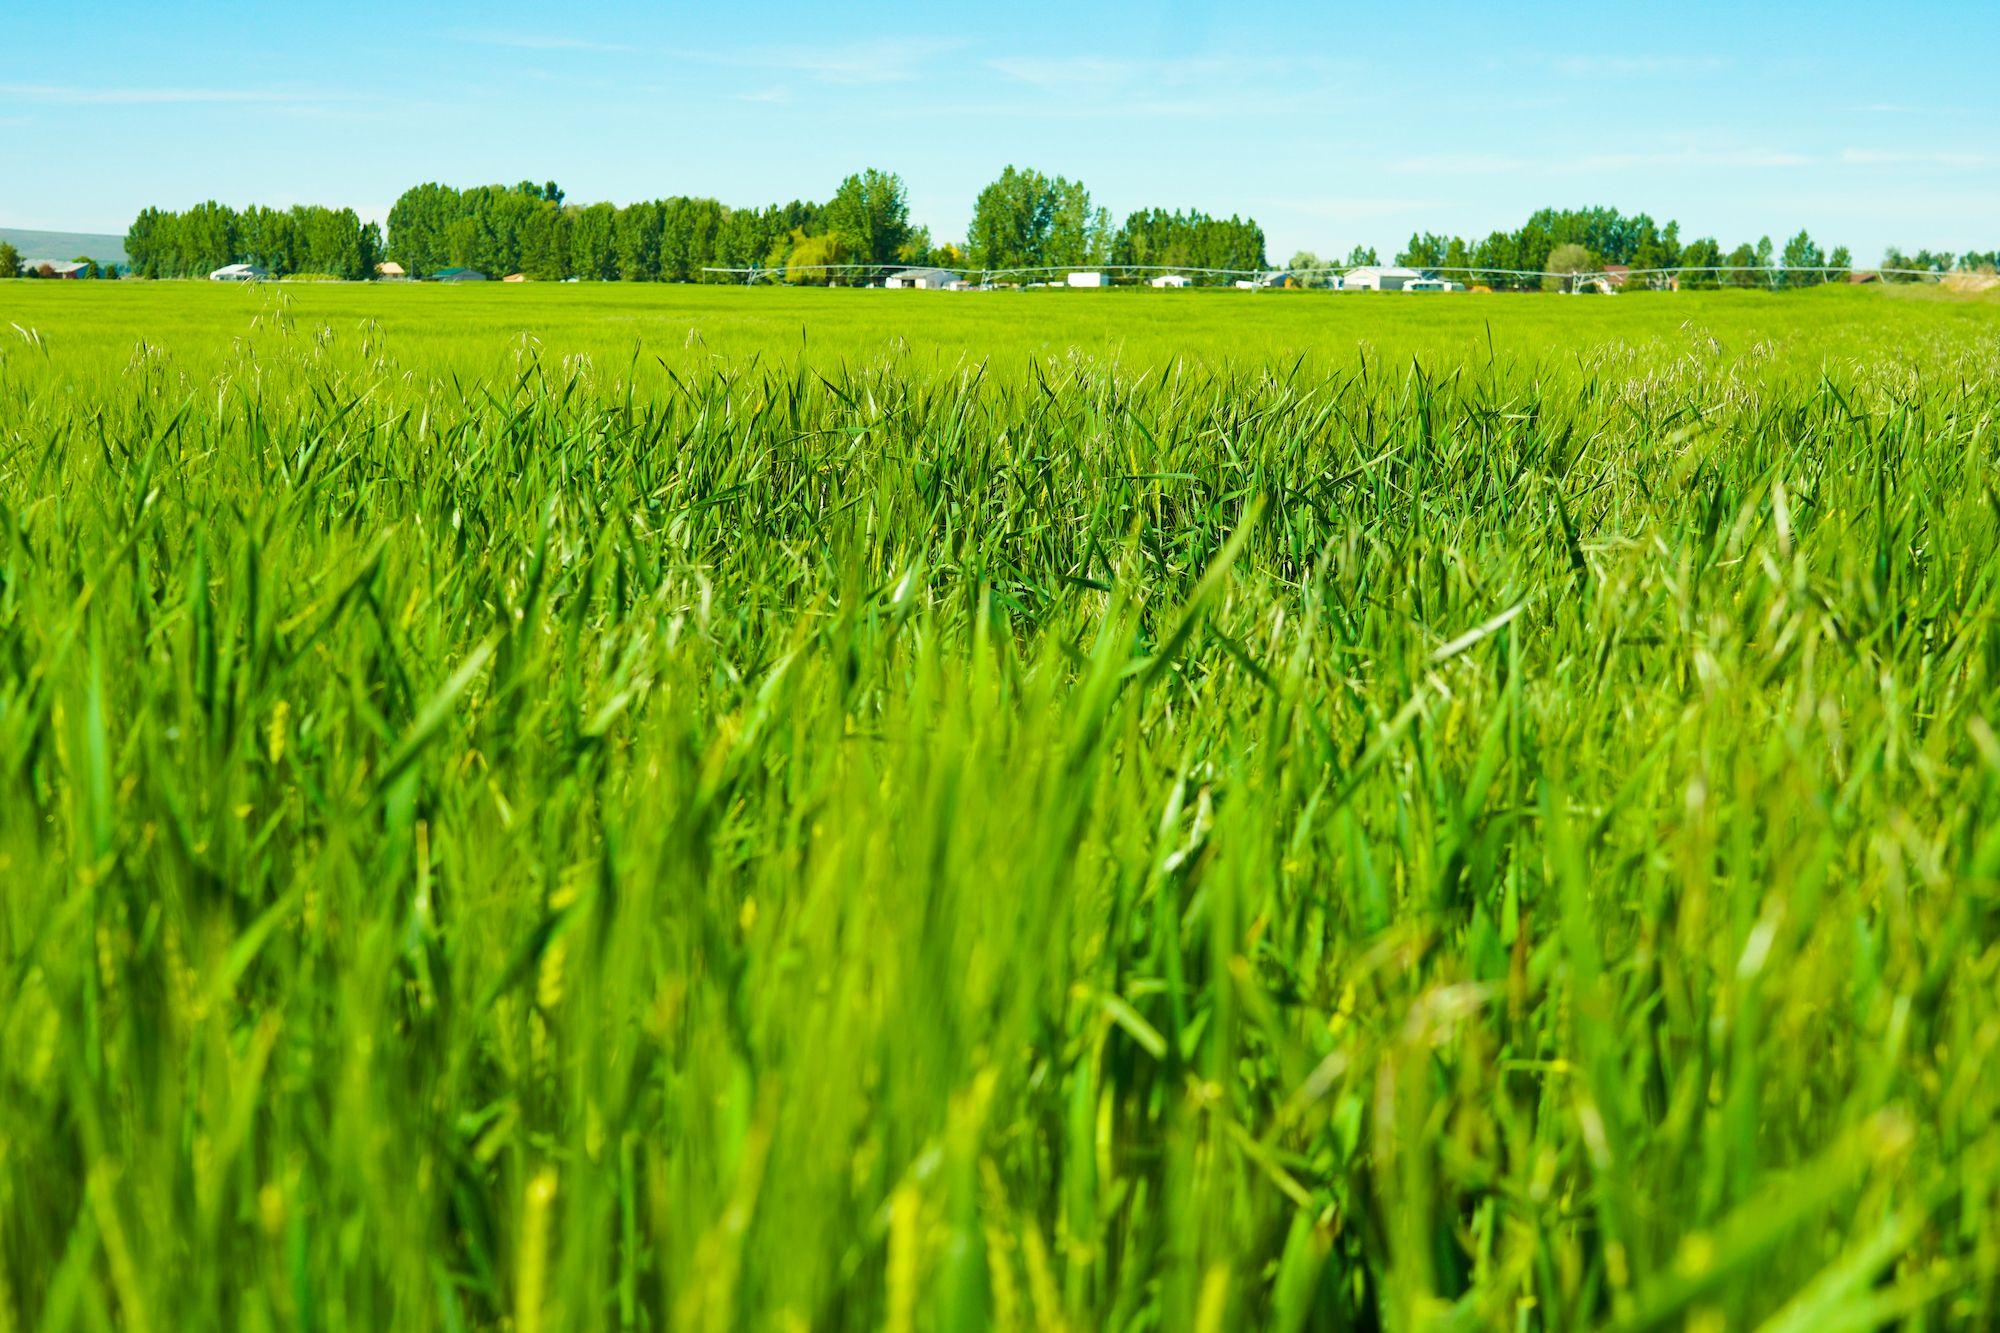 Growing Barley Field